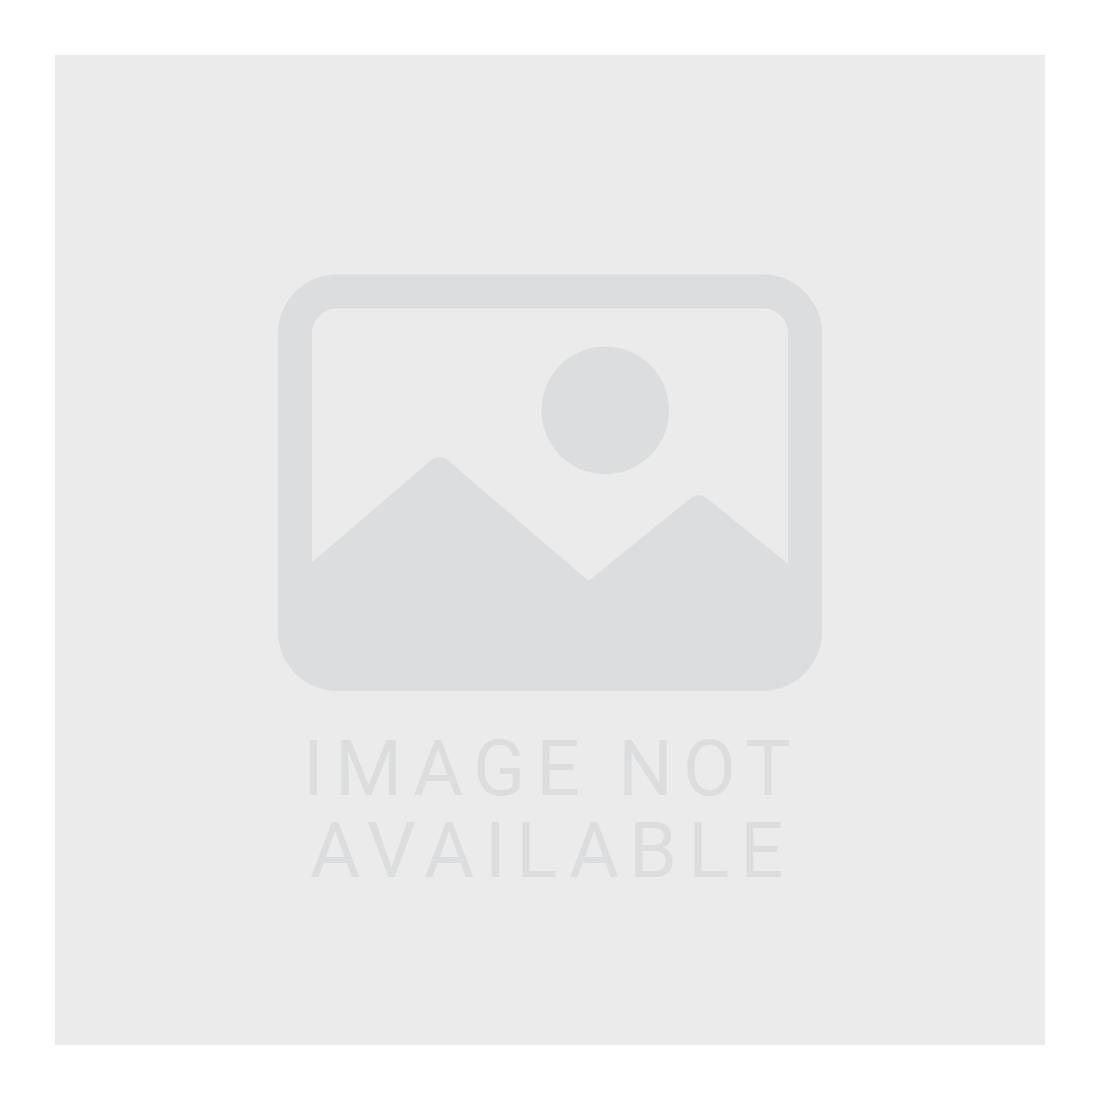 $50 FIAT Merchandise Gift Card